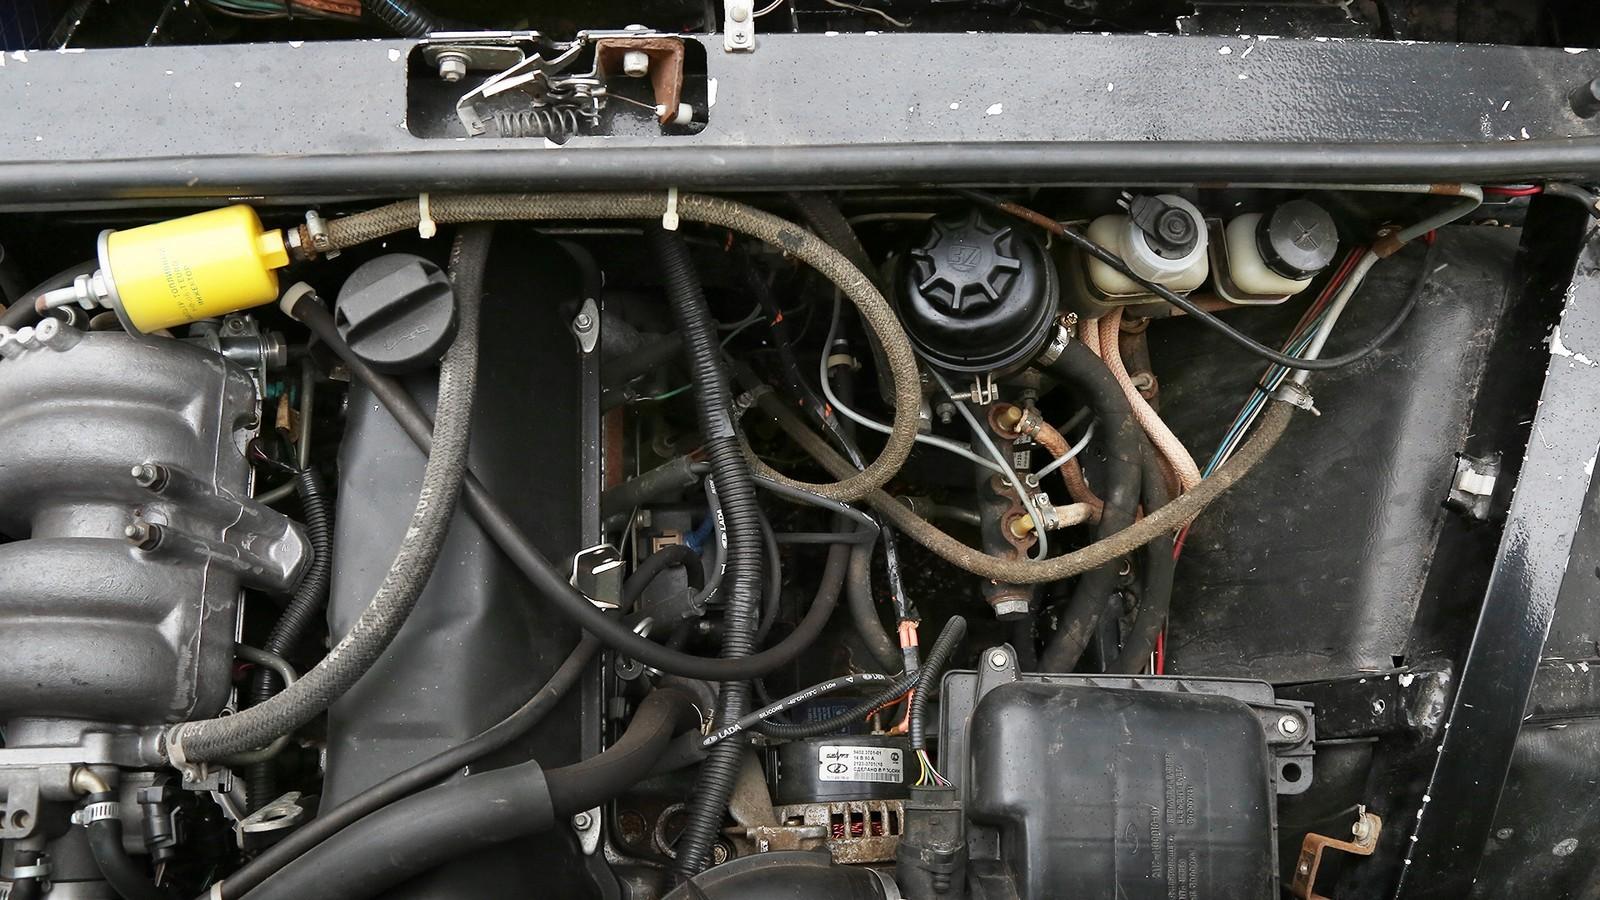 KC2A4378